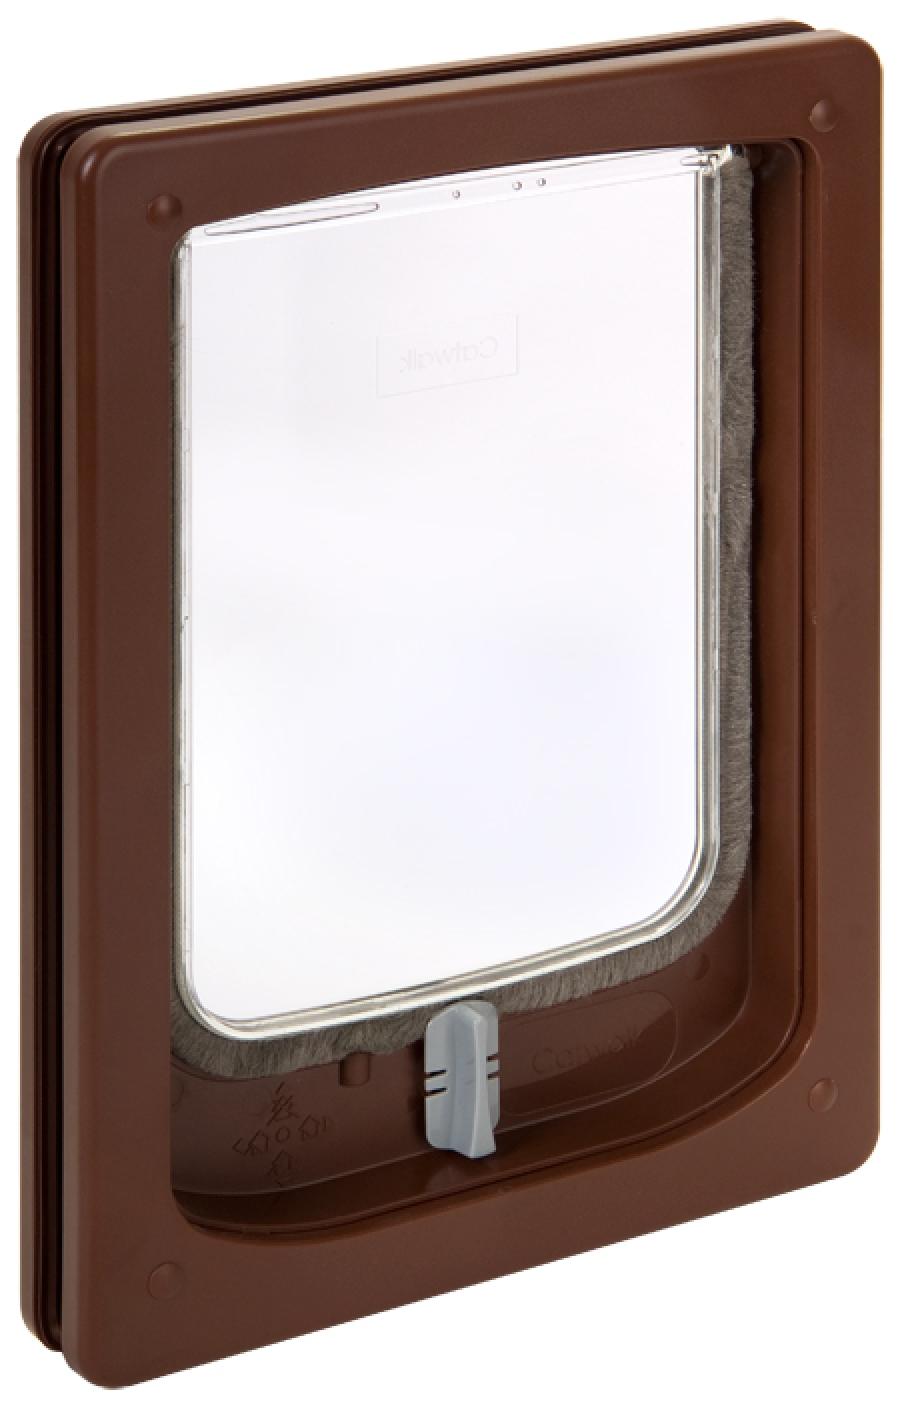 W-SDDB Wood Fitting Small Dog Door Slim Line Brown.jpg